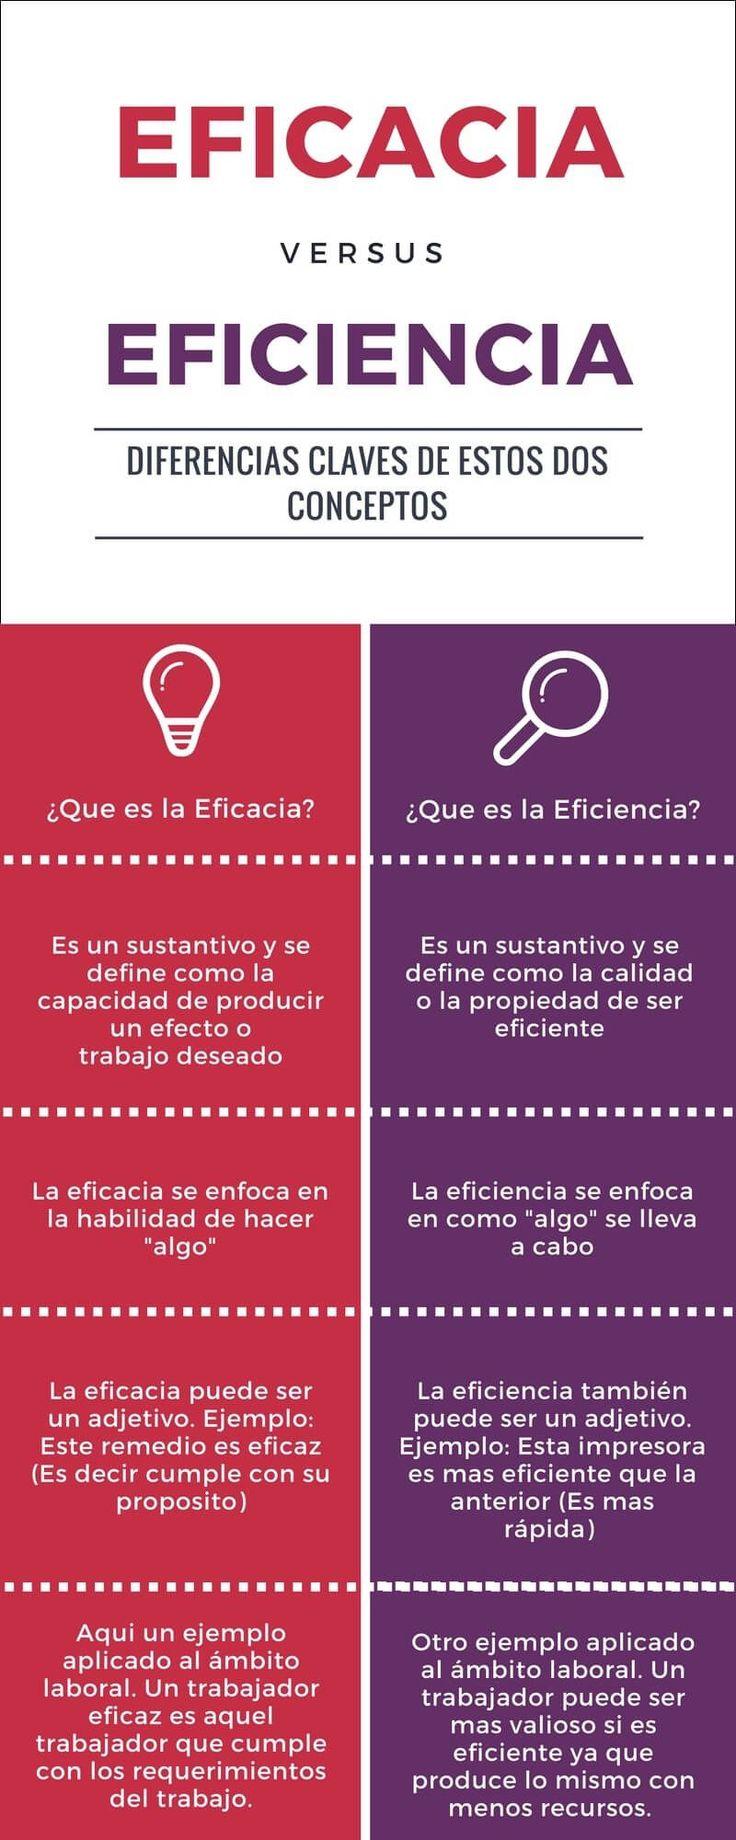 Infografia de Eficacia vs Eficiencia